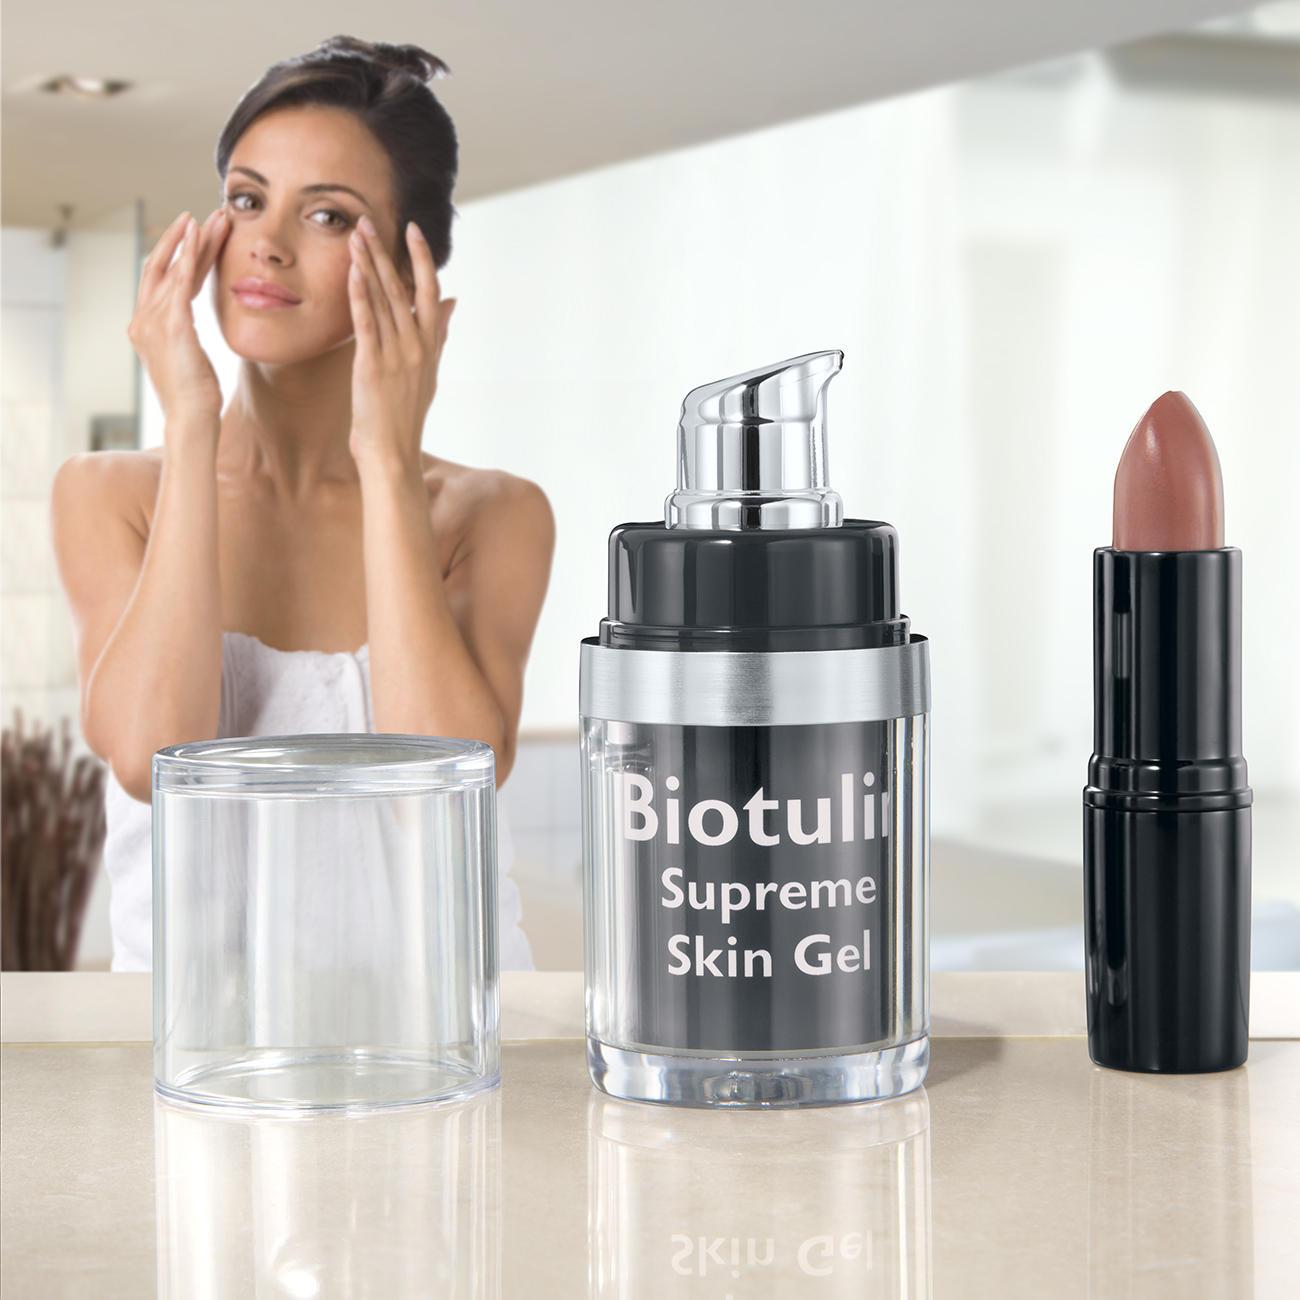 Biotulin Supreme Skin Gel Serum, 15 ml :: Weiß -  -  - Erwachsene